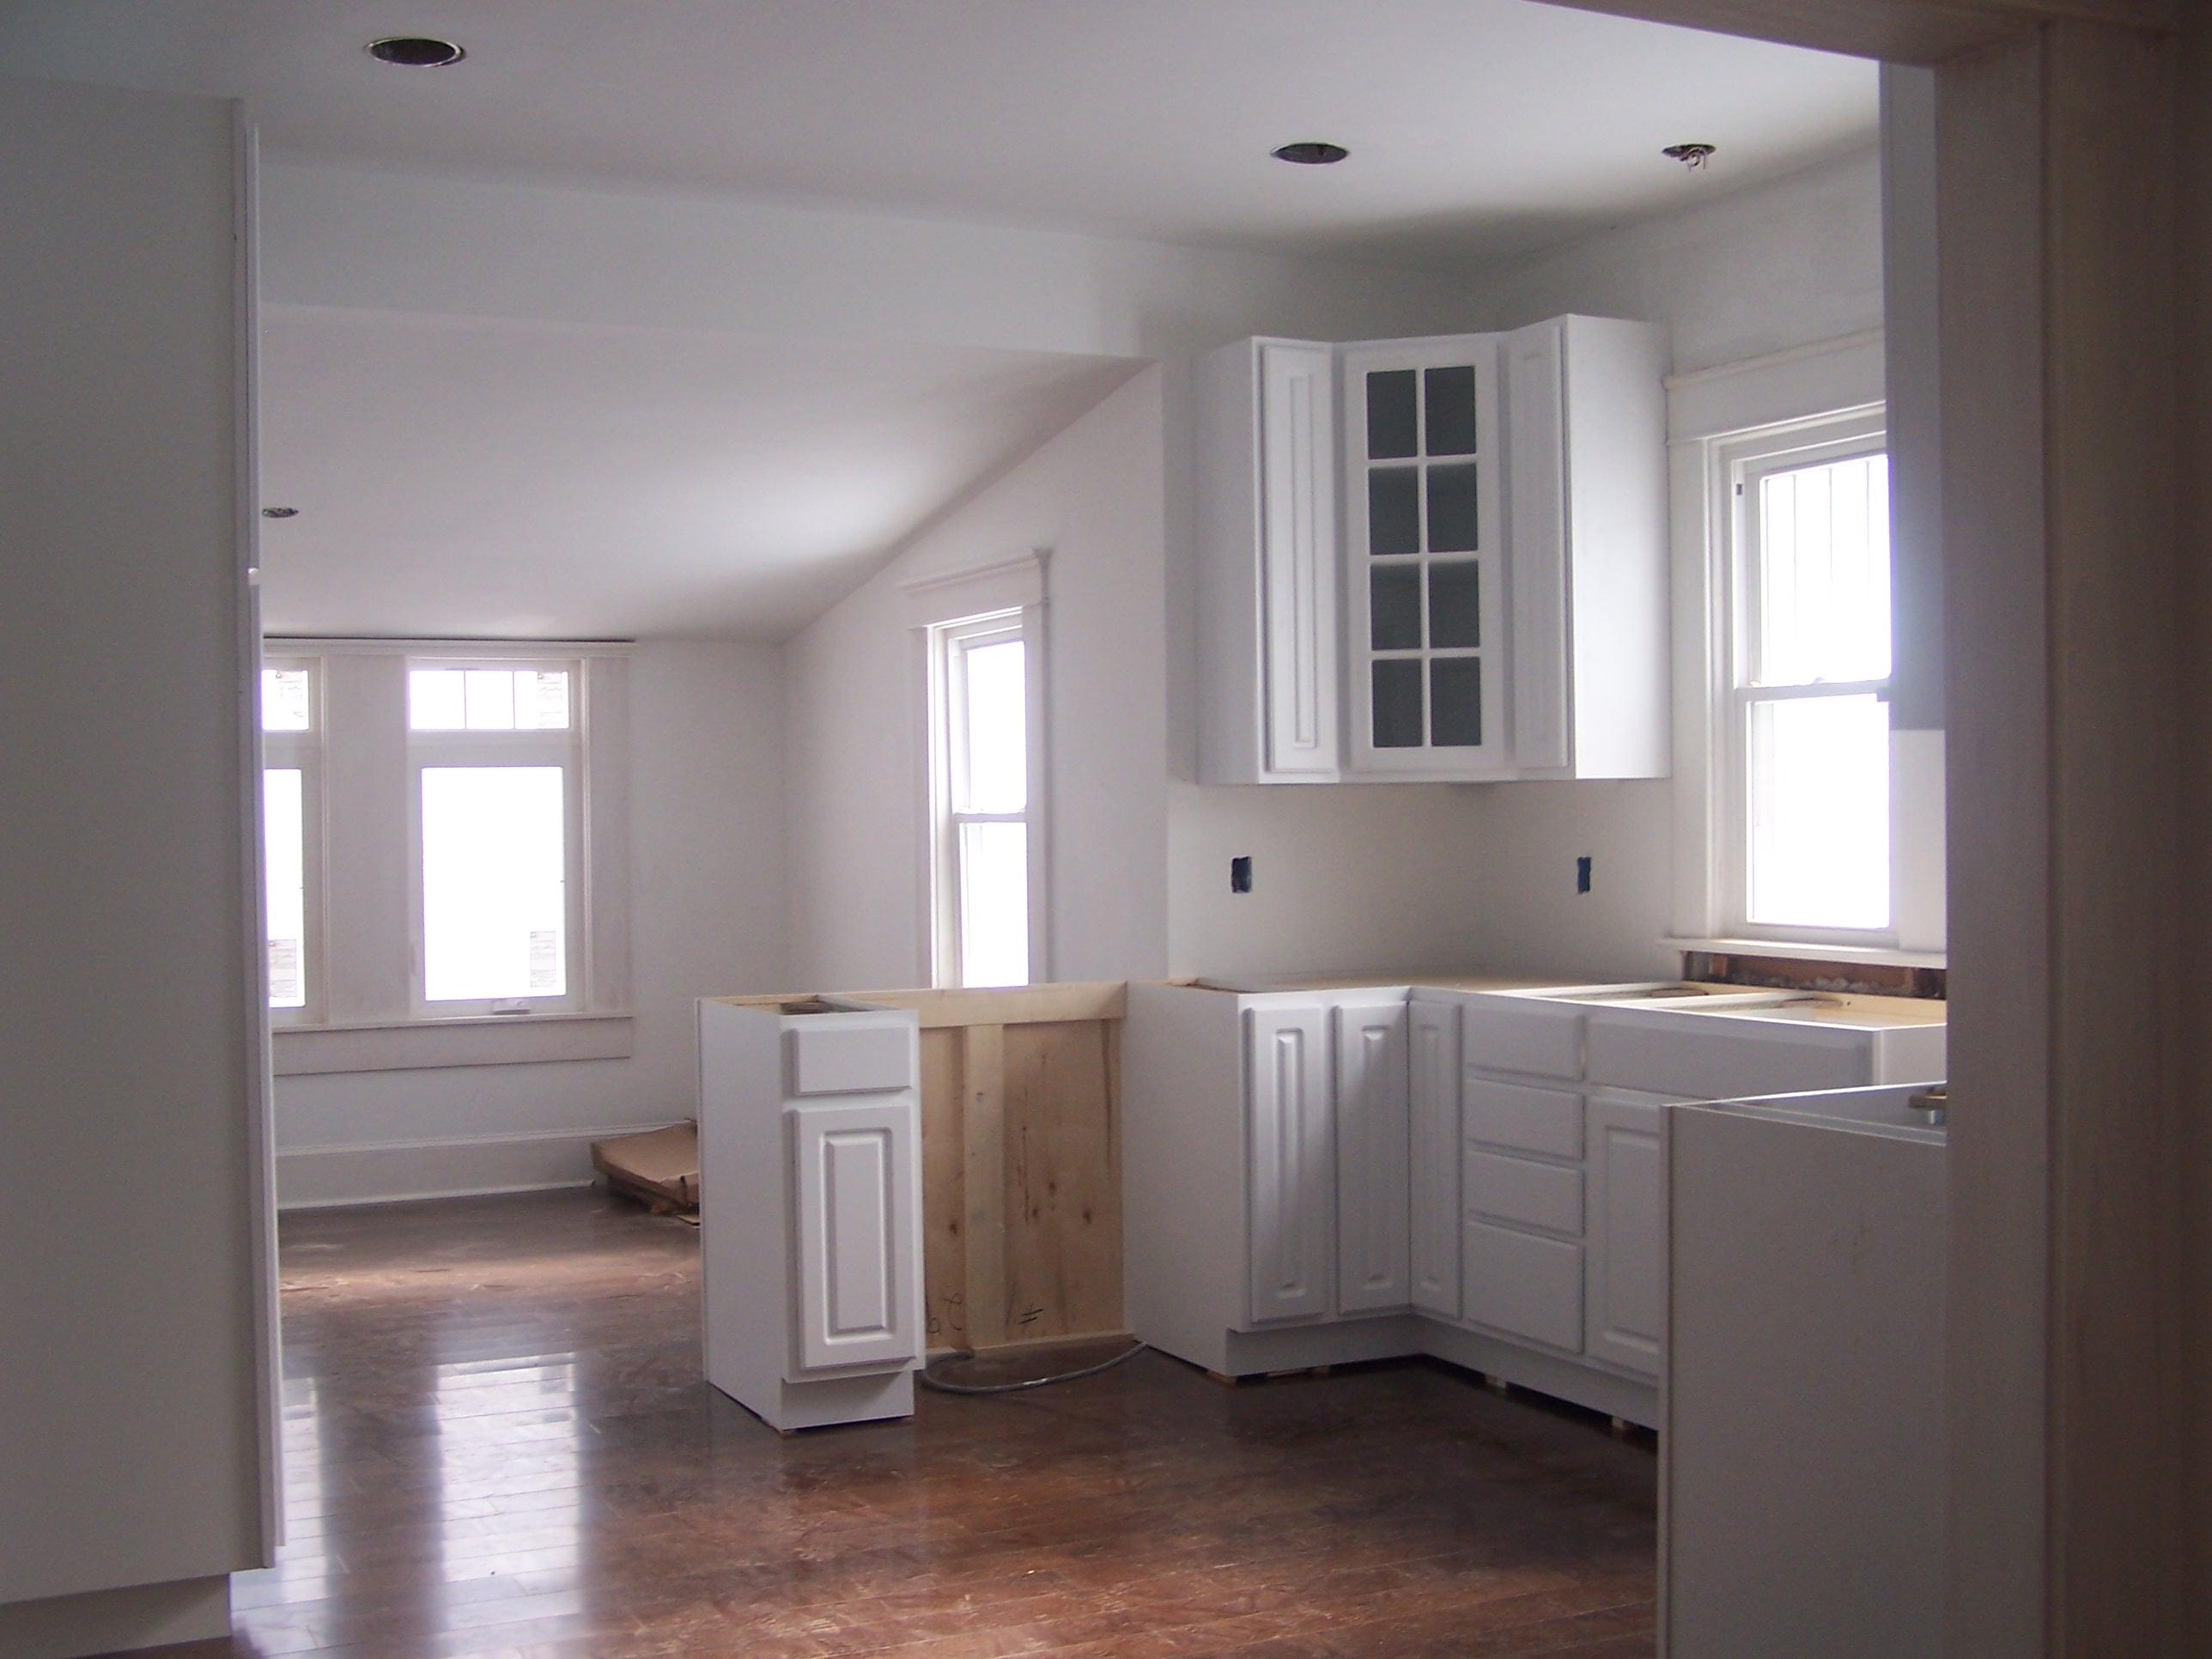 bungalow 404 kitchen progress